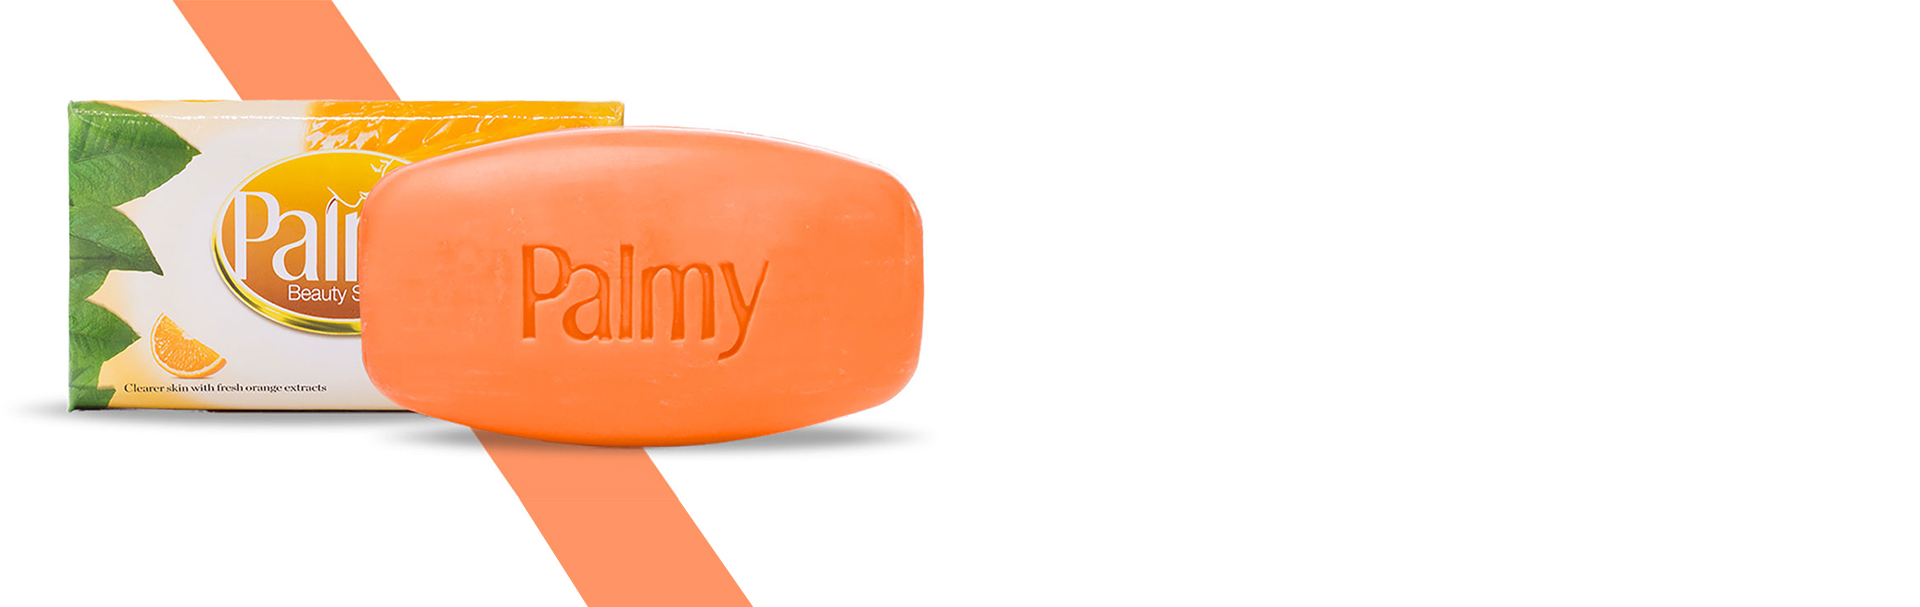 Palmy Beauty Soap Orange Fragrance